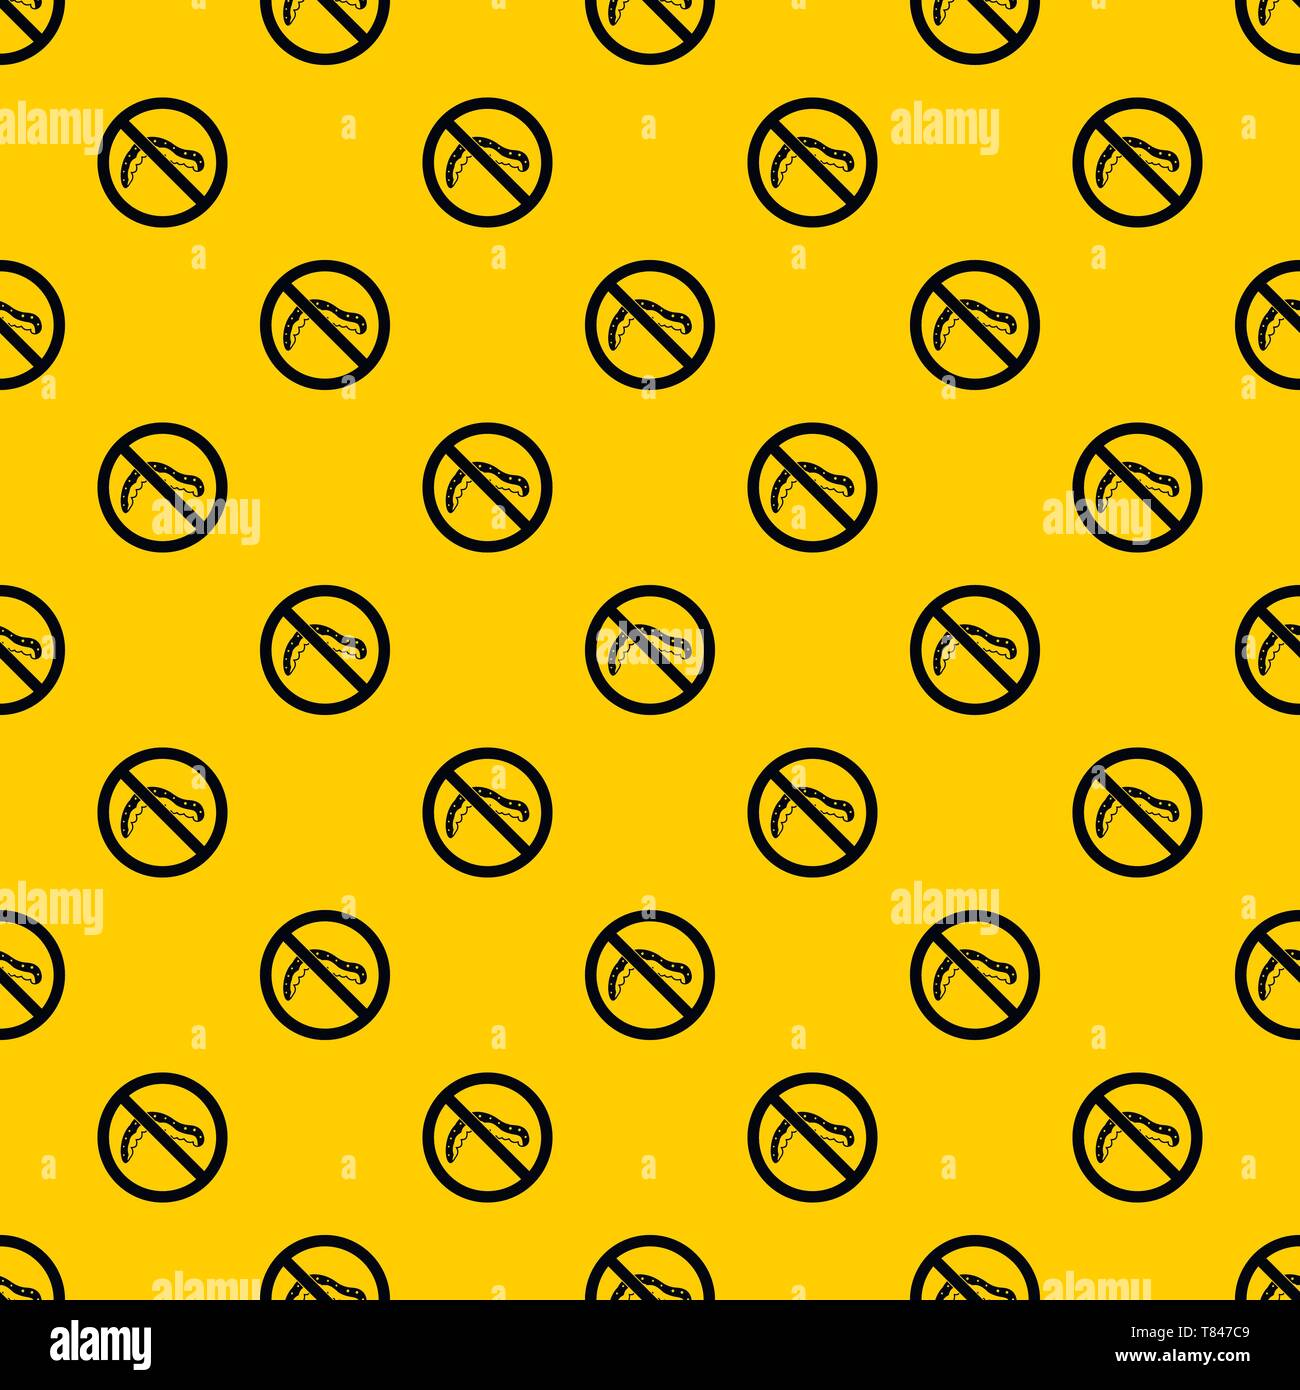 No caterpillar sign pattern vector - Stock Image